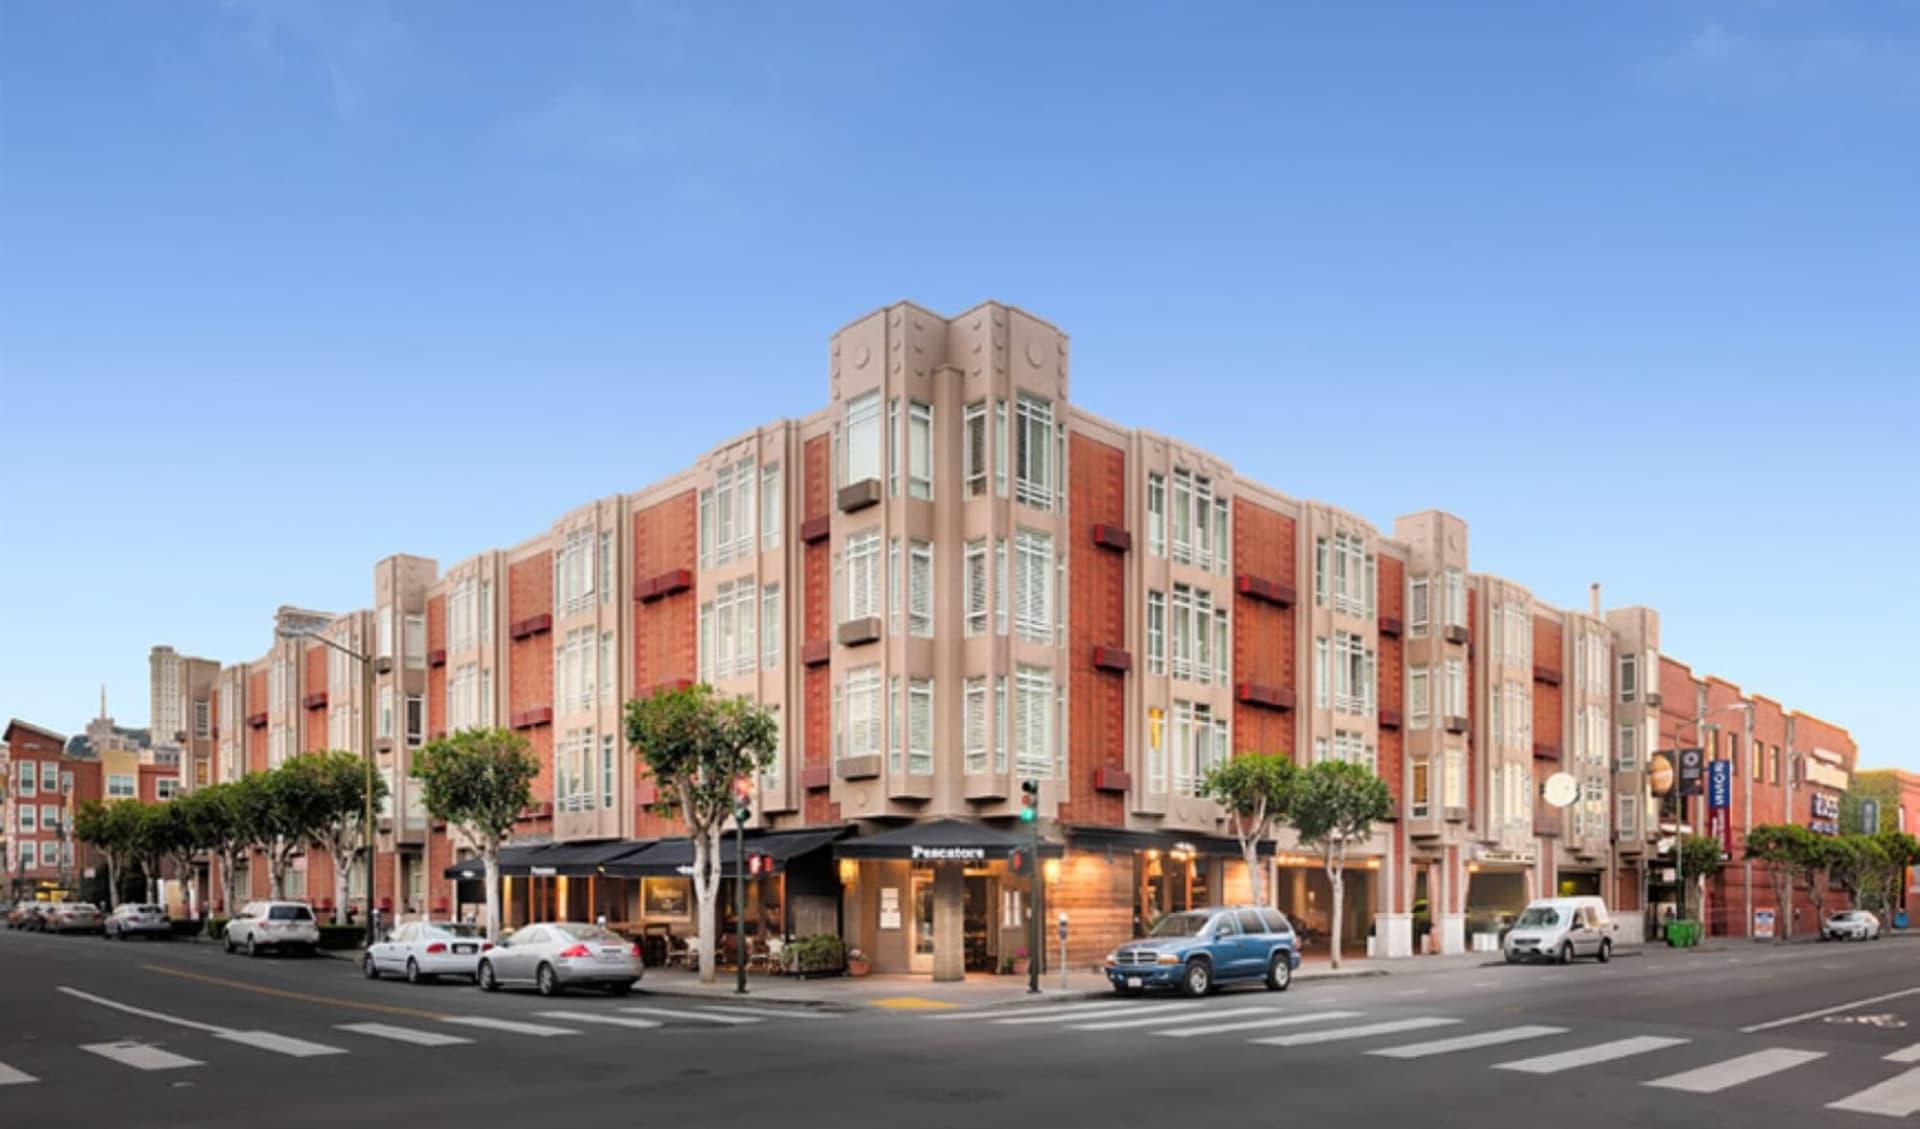 Hotel Zoe Fisherman's Wharf in San Francisco: Exterior_Hotel Zoe_Aussenansicht_ATI